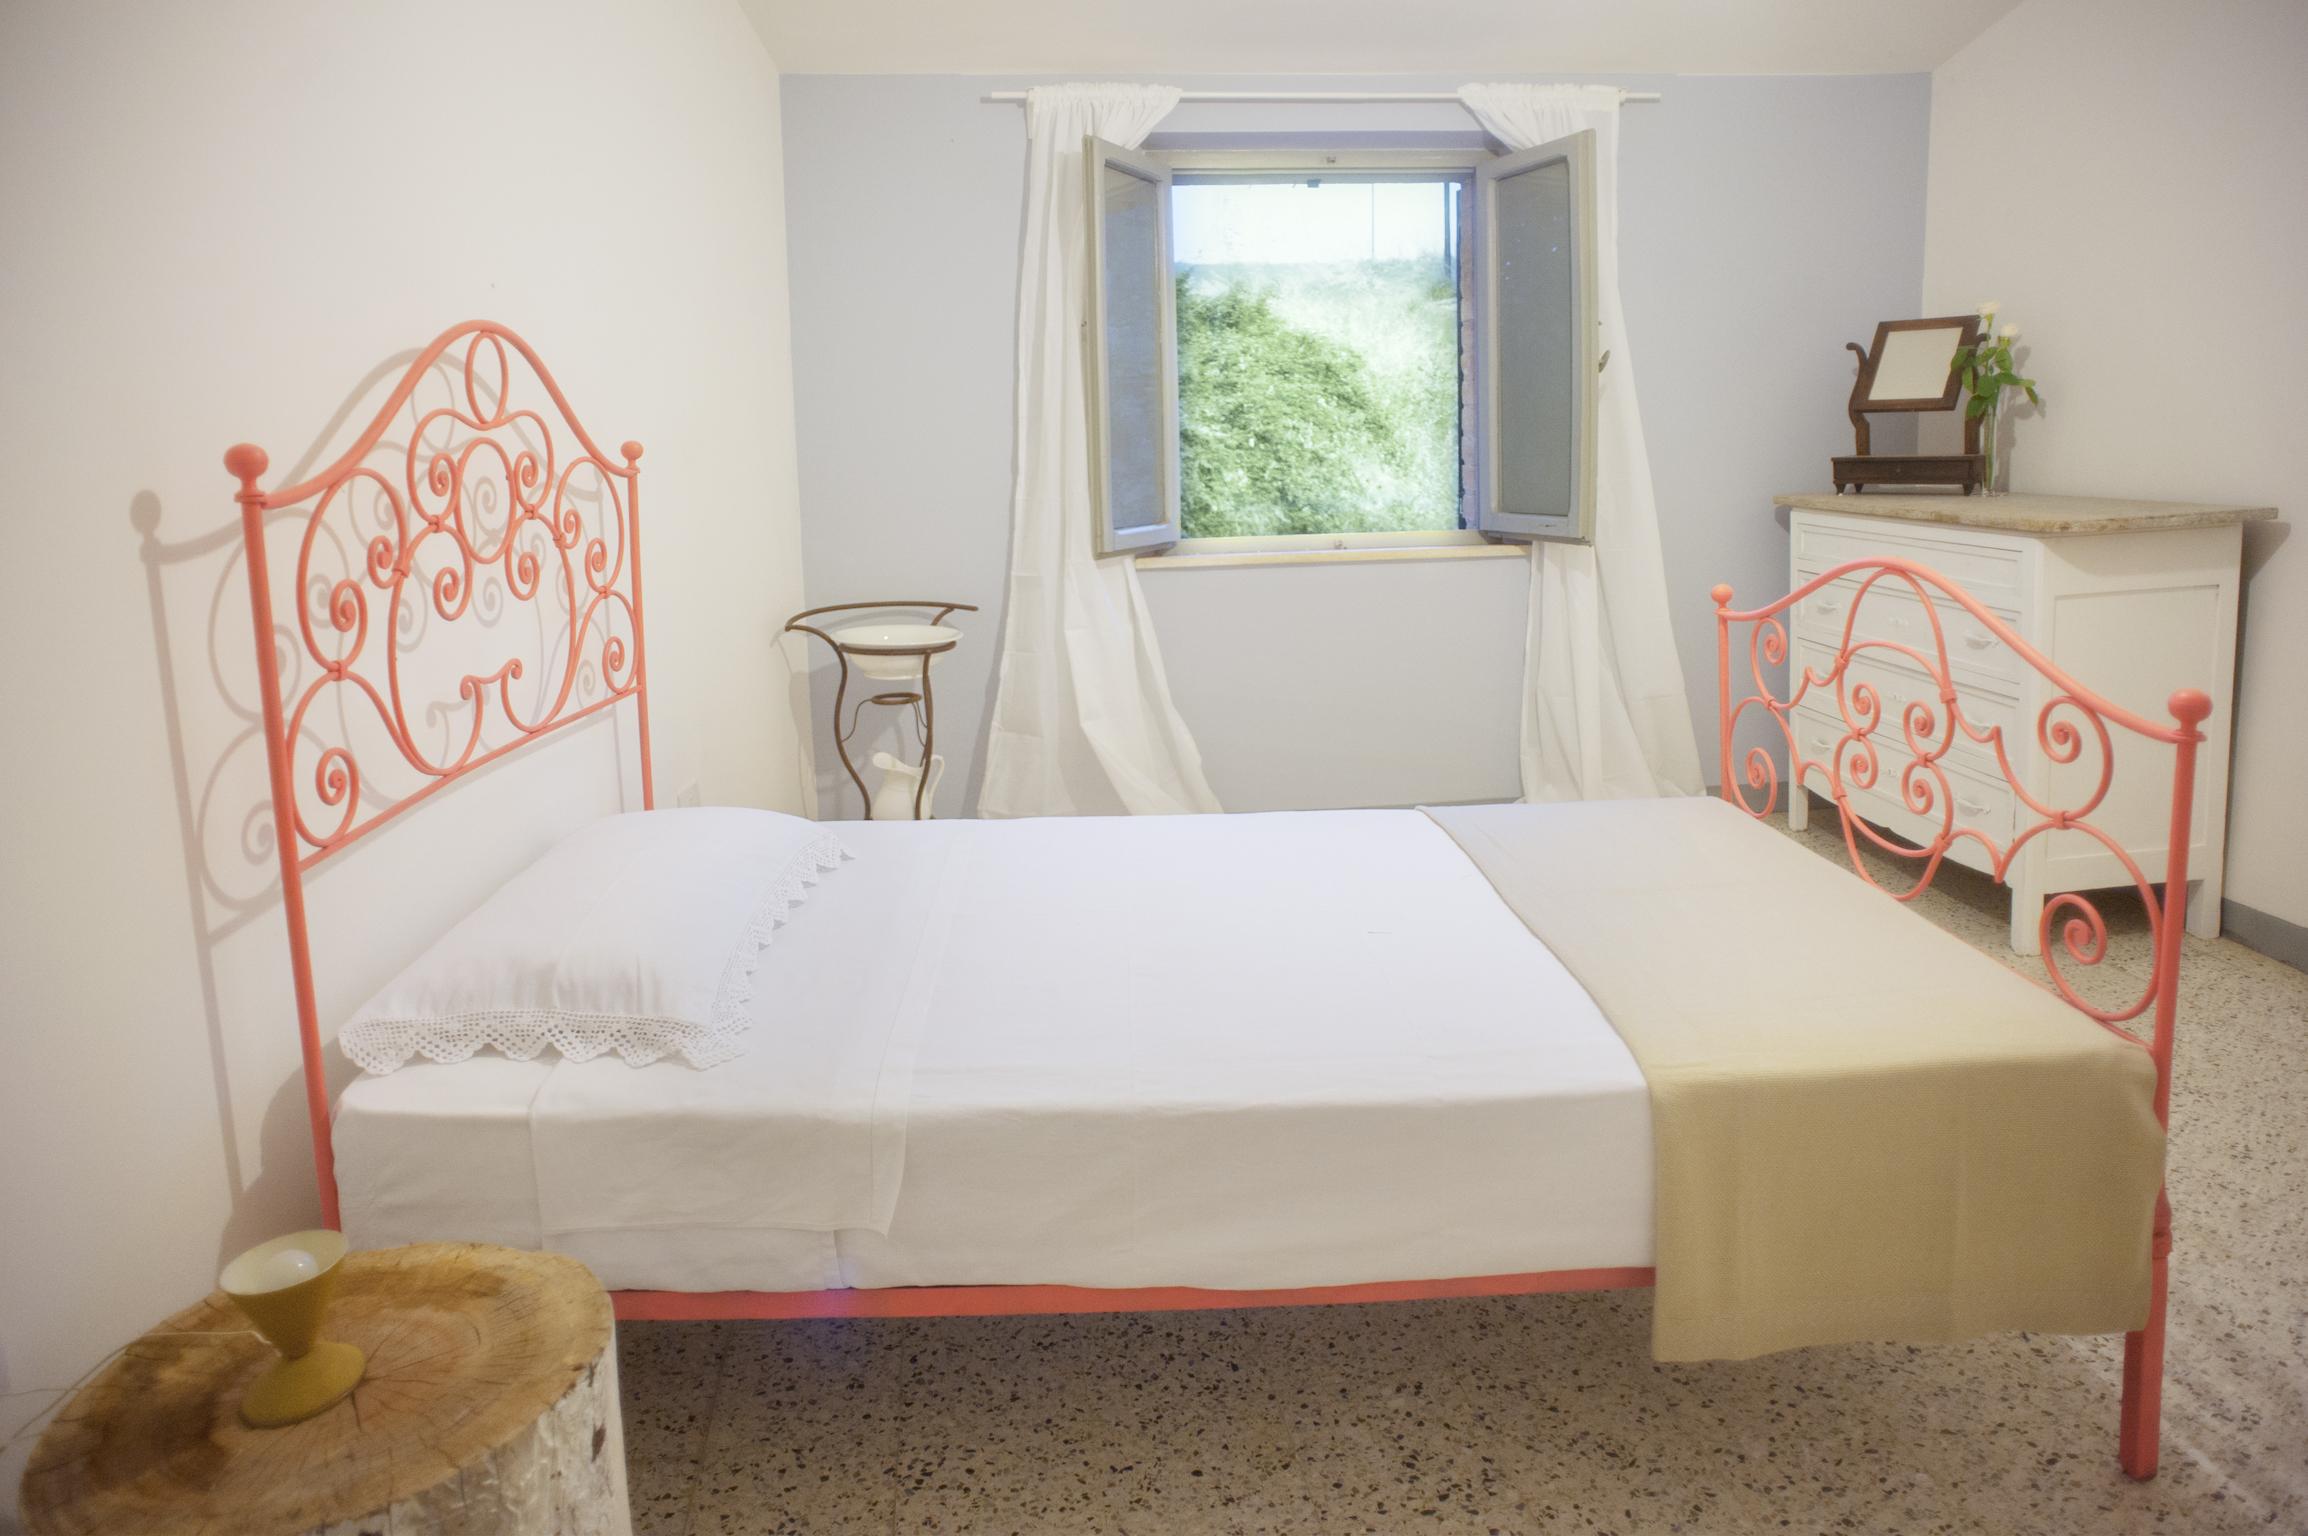 Palazzaccio-Todi- 3rd bedroom